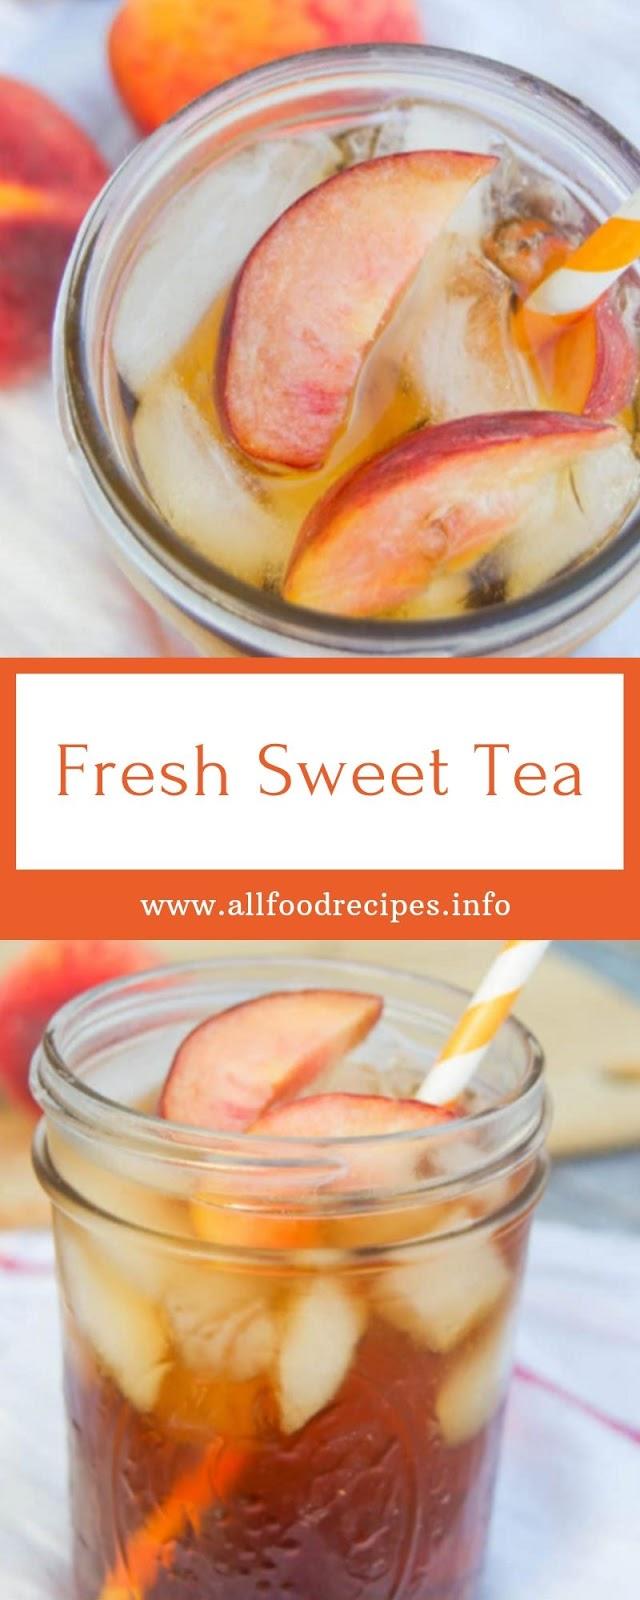 Fresh Sweet Tea